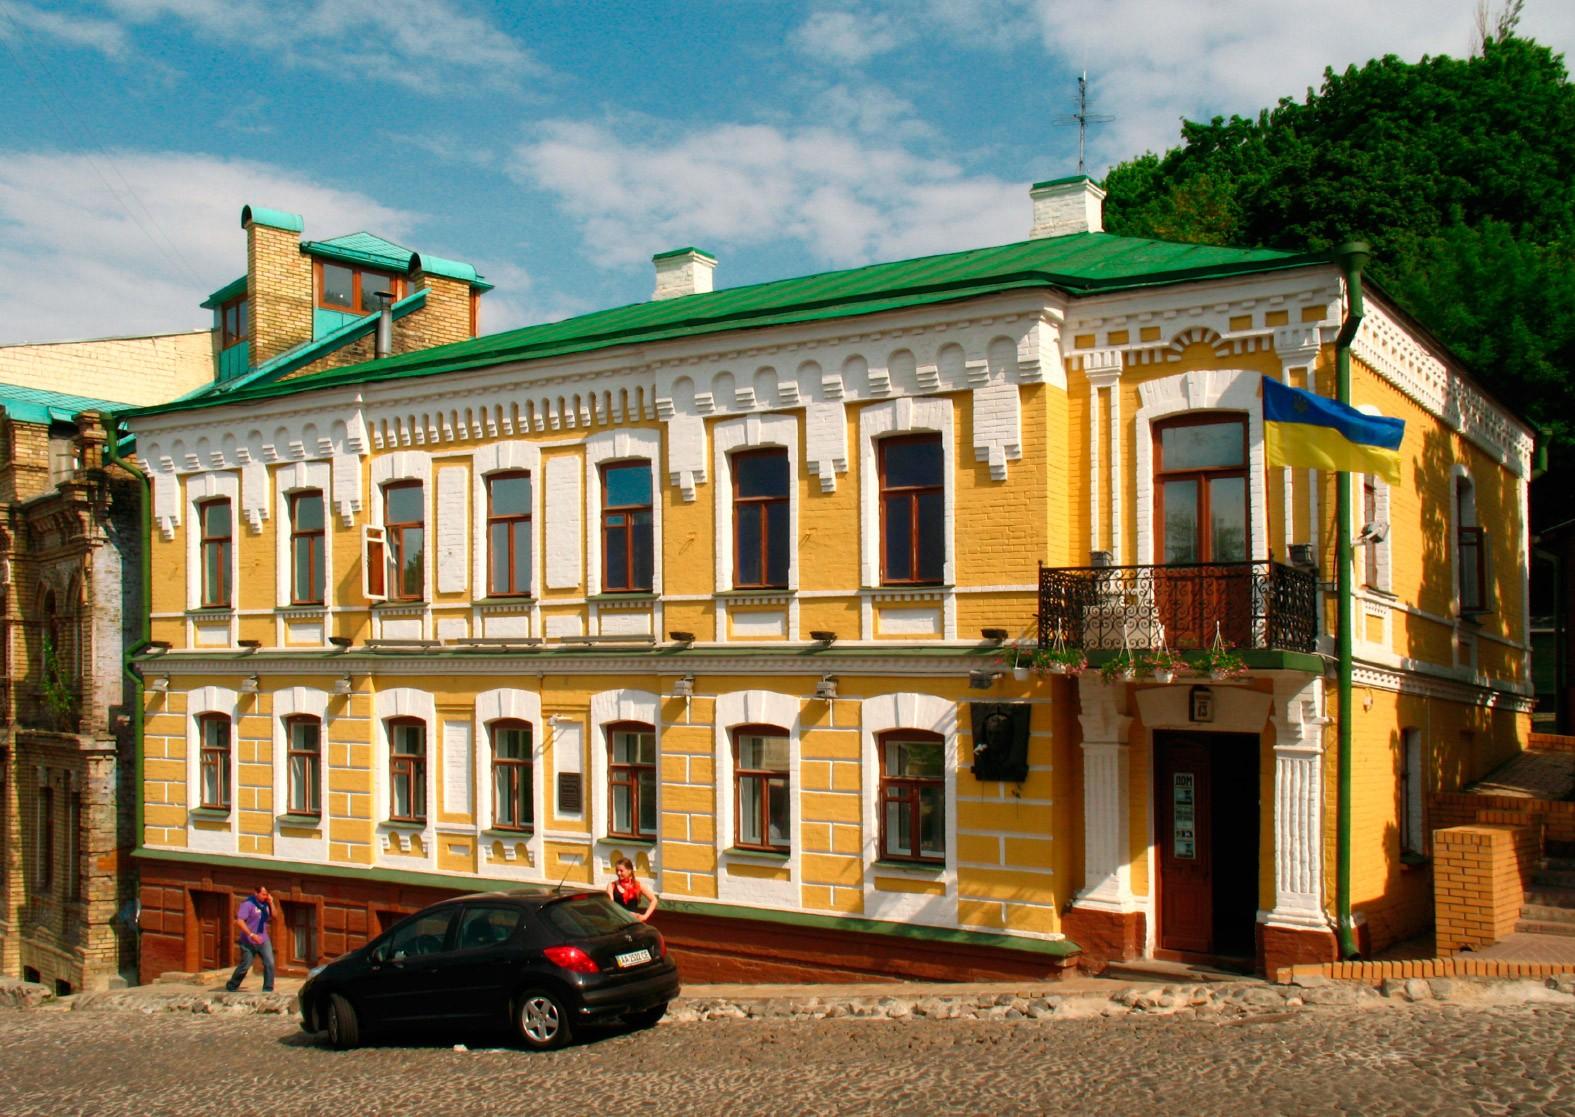 Столичный музей Булгакова приглашает на аудиоэкскурсию